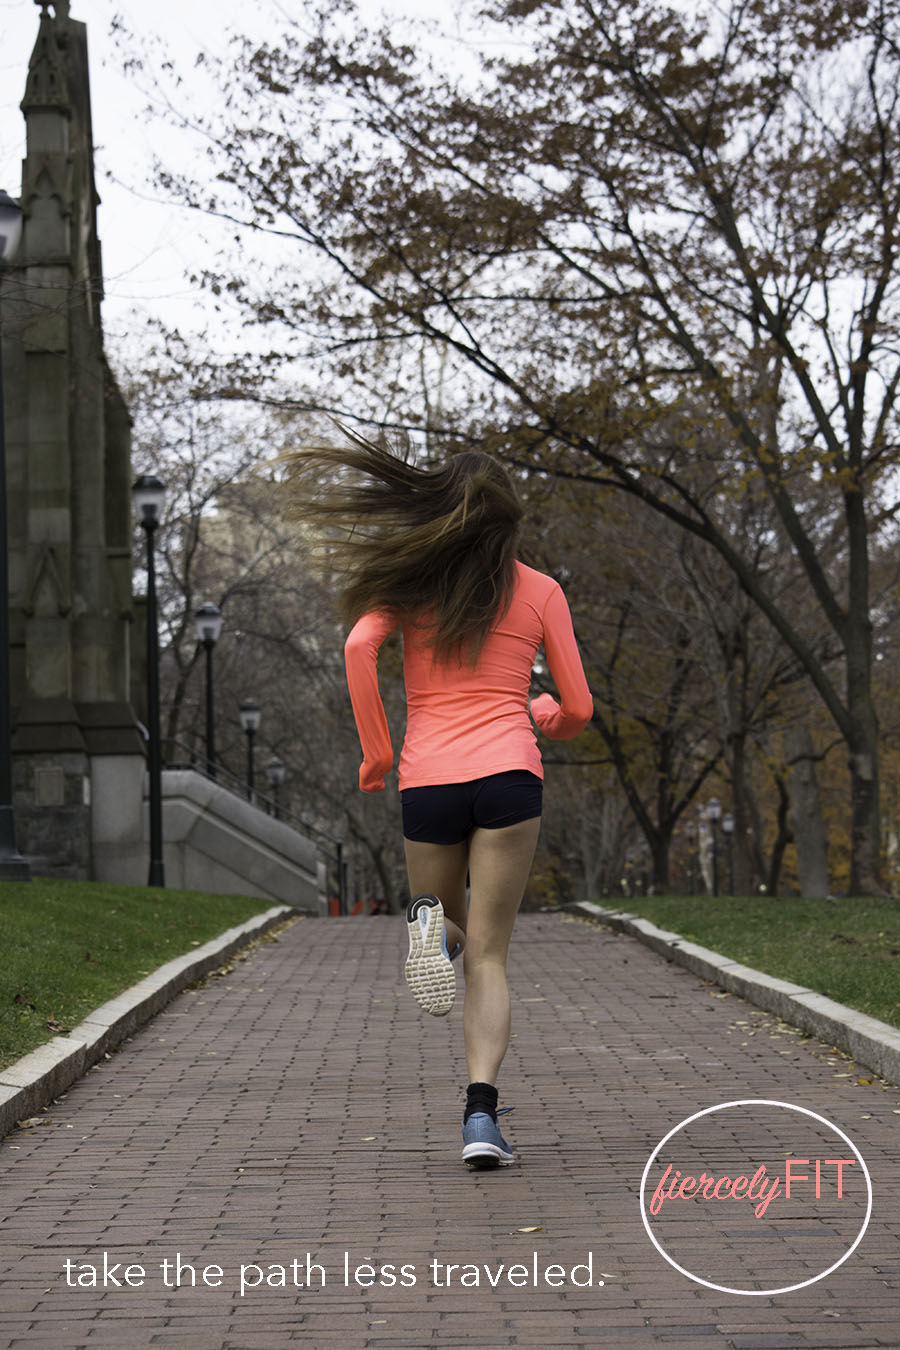 Joy_Lewis_Branding_Athletic_Wear_Fiercly_Fit_Running_Path